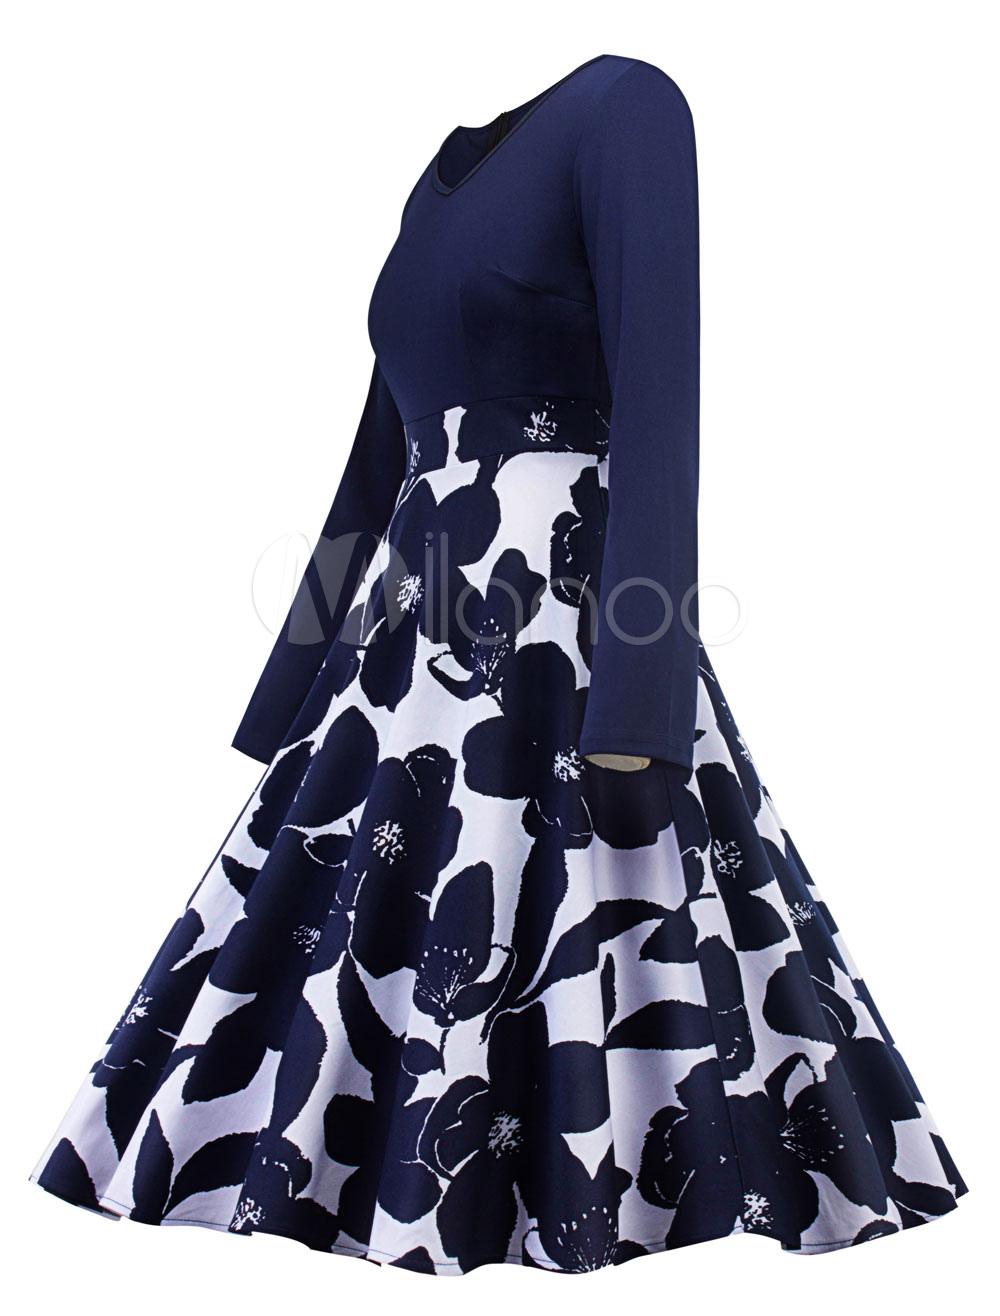 b2b6088bcb0c ... Women Vintage Dress 1950s Floral Swing Dresses Long Sleeve Navy Spring  Dress-No.2 ...